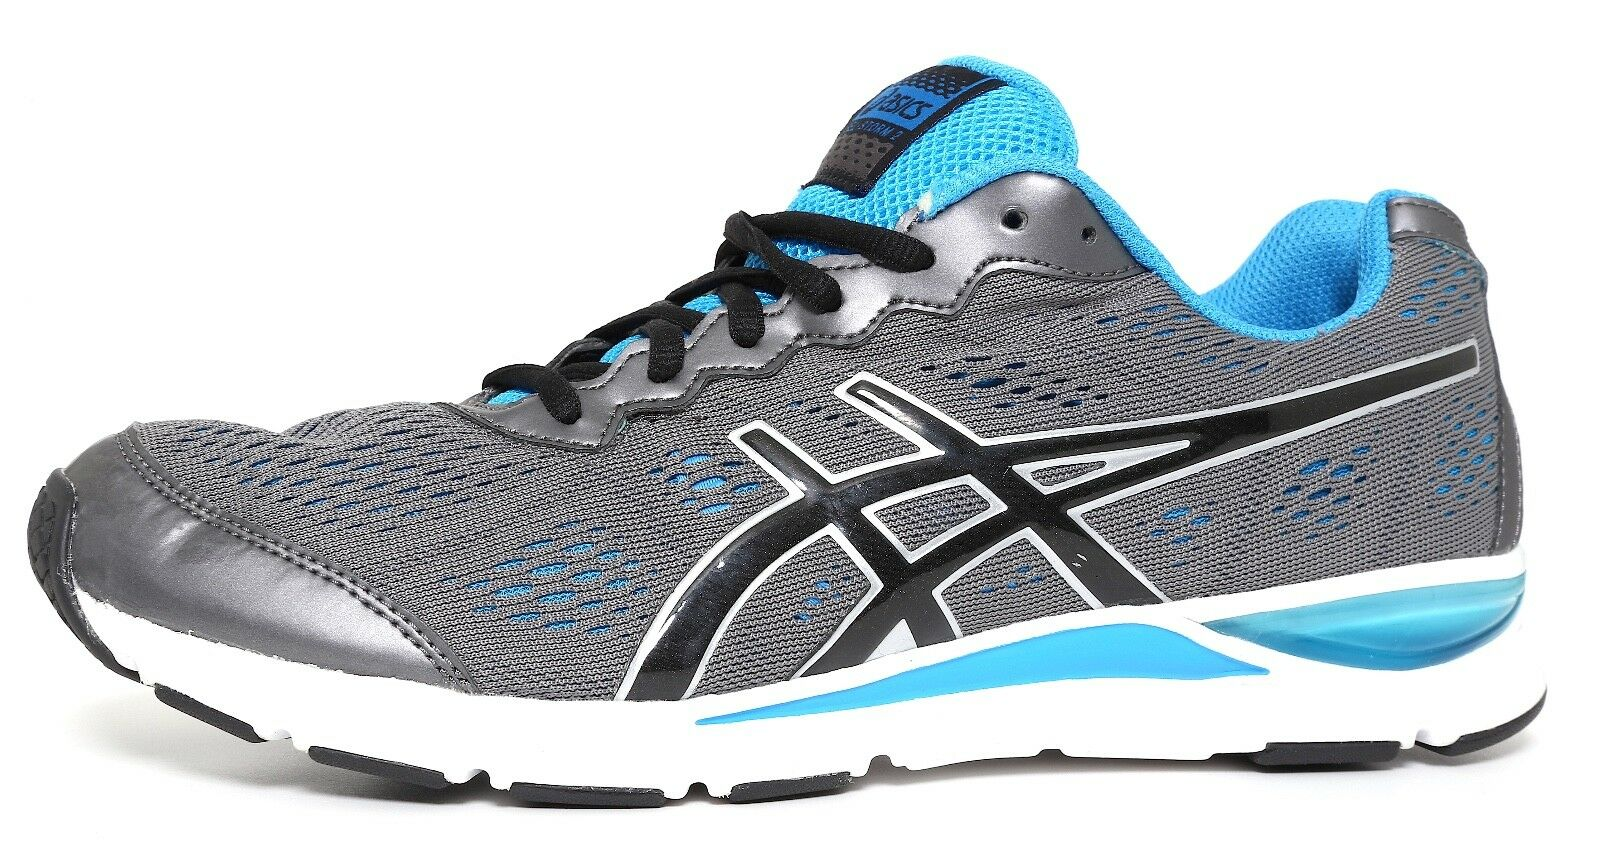 Asics Gel Storm 2 Running shoes Grey bluee Men Sz 9.5 3005